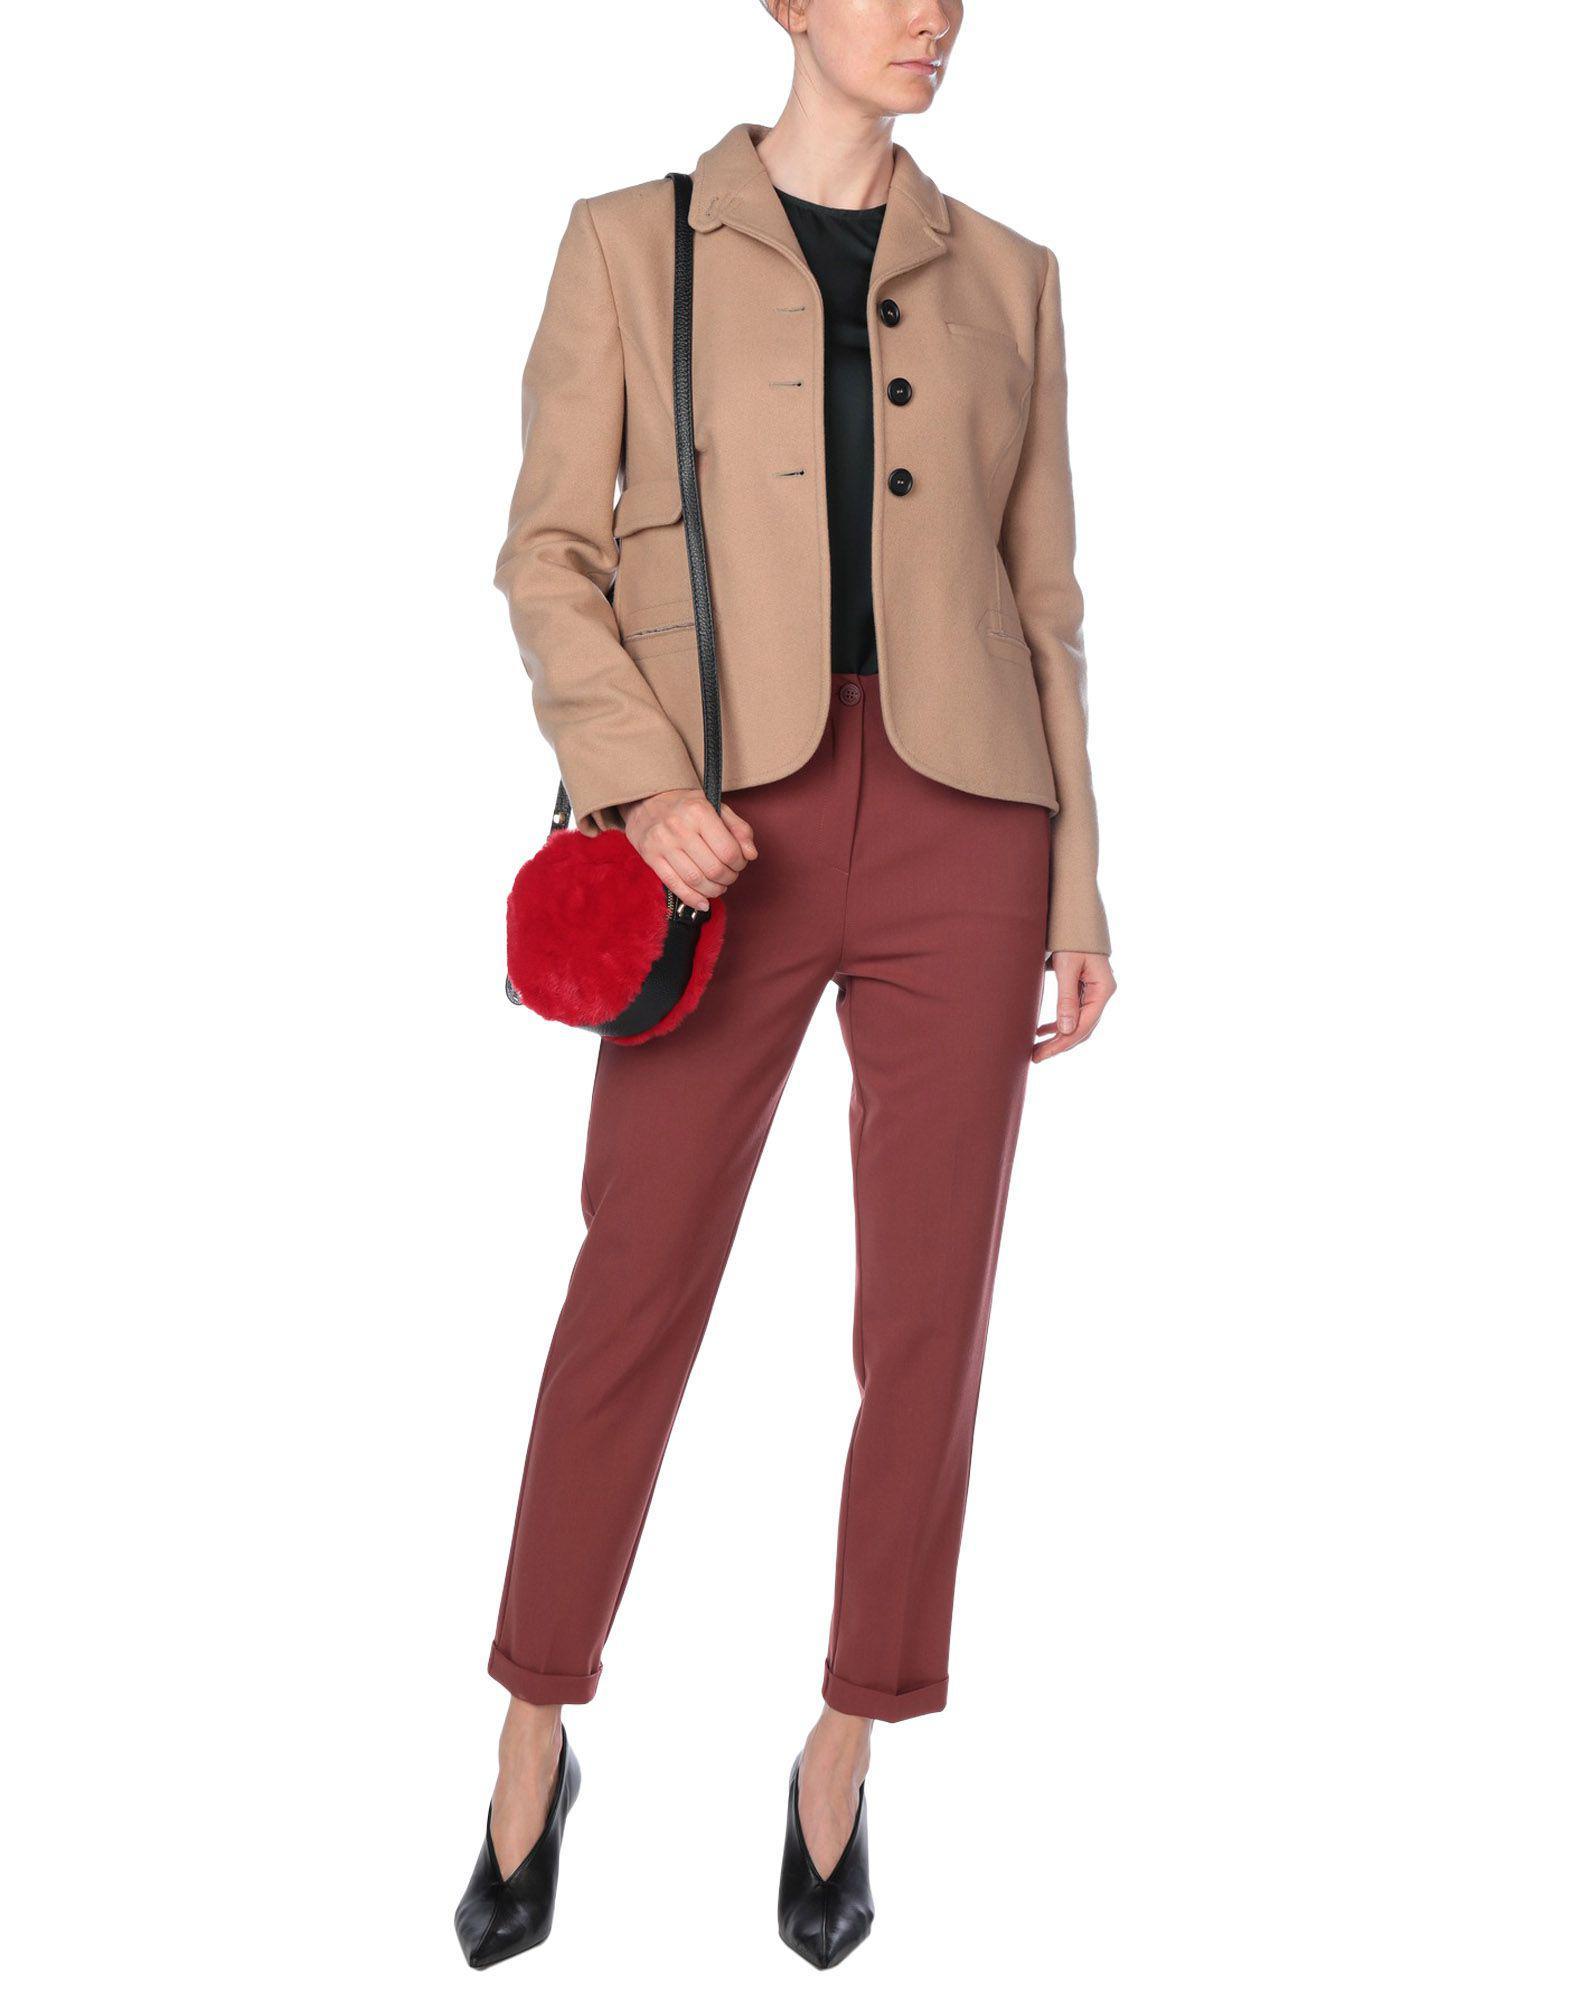 Ab Asia Bellucci Cross-body Bag in Red